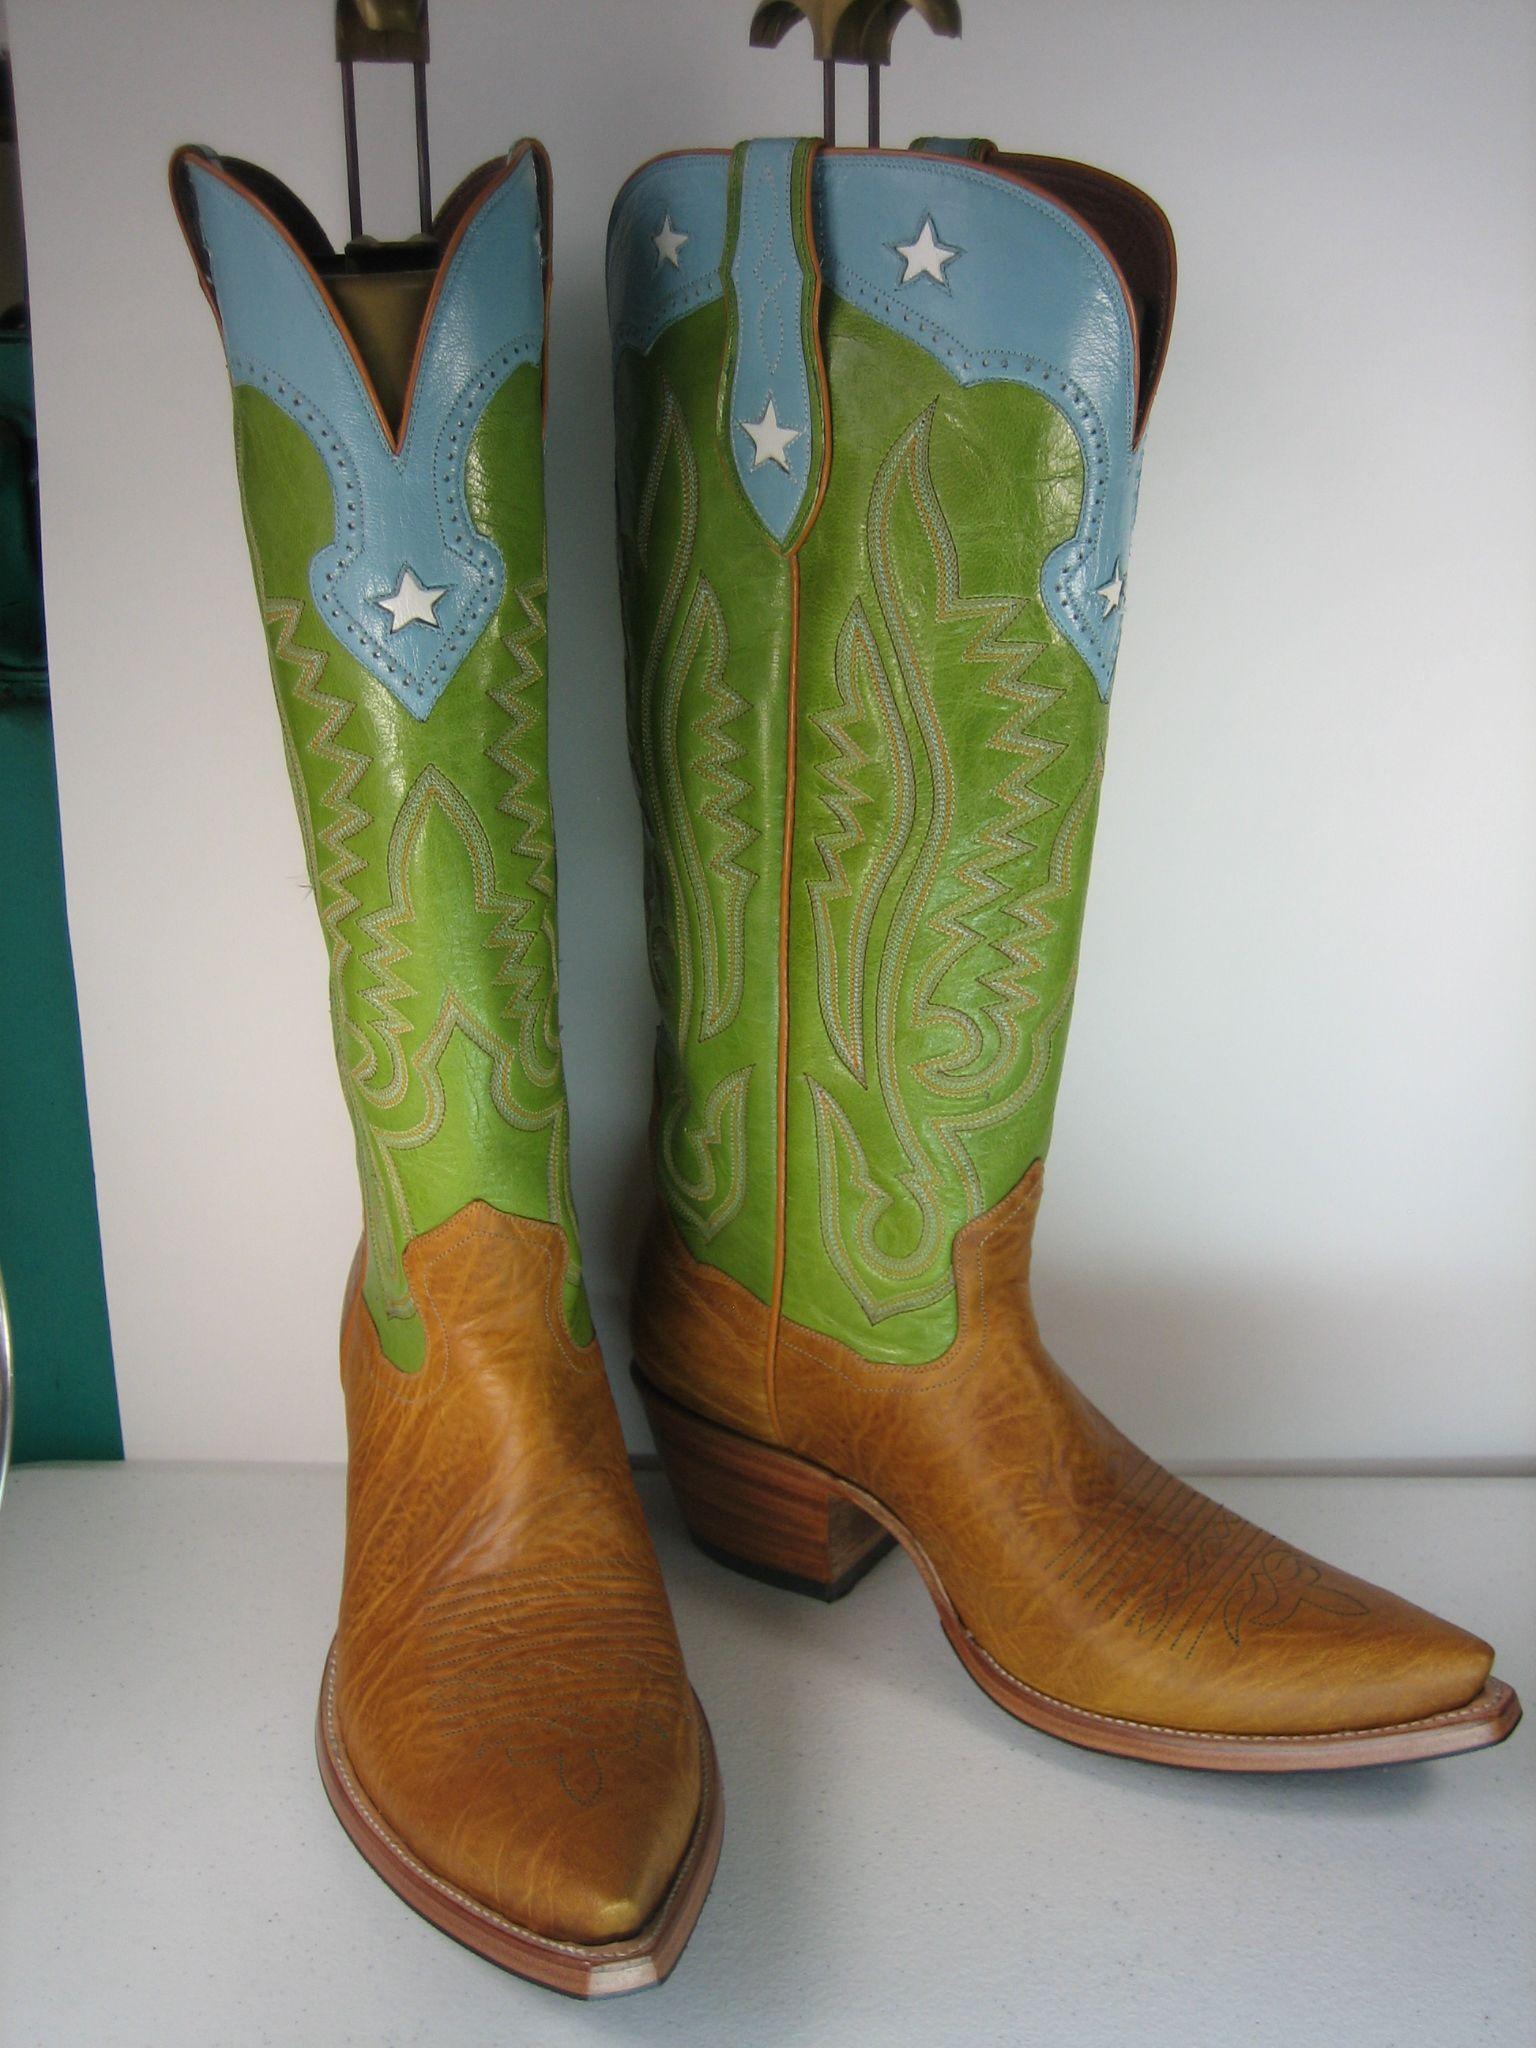 Custom Cowboy Boots, handmade by Legendary Boot Co., El Paso